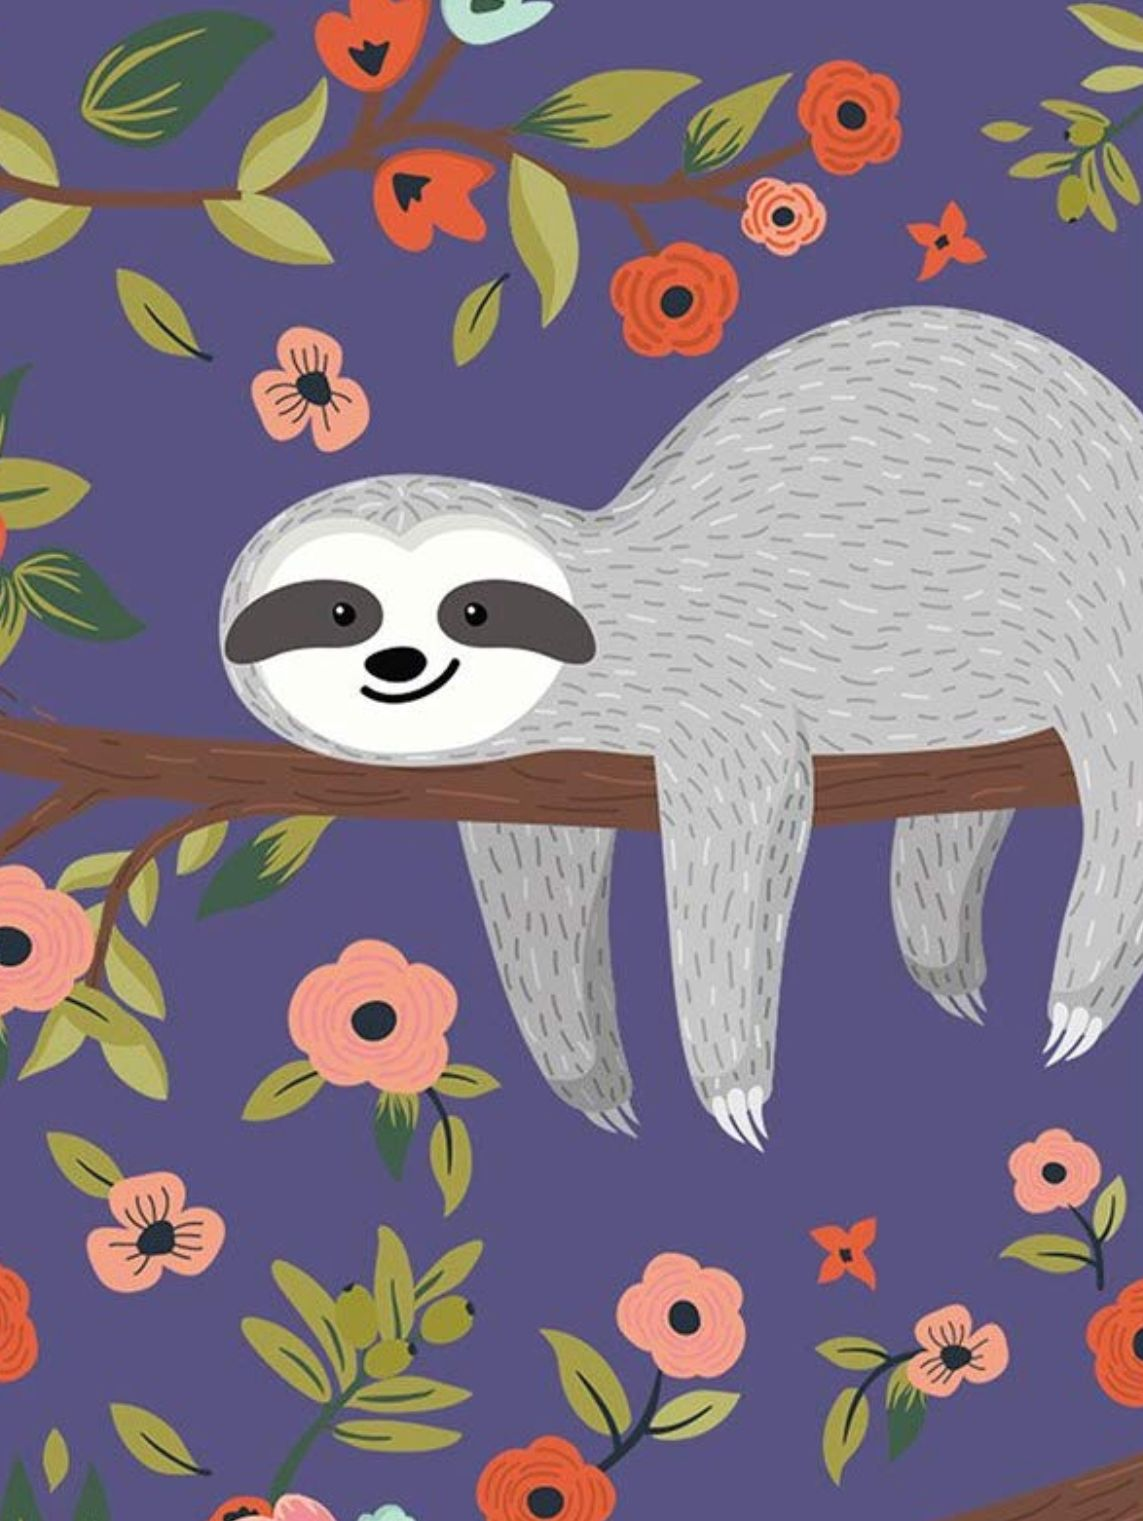 Free Sloth Wallpaper Iphone